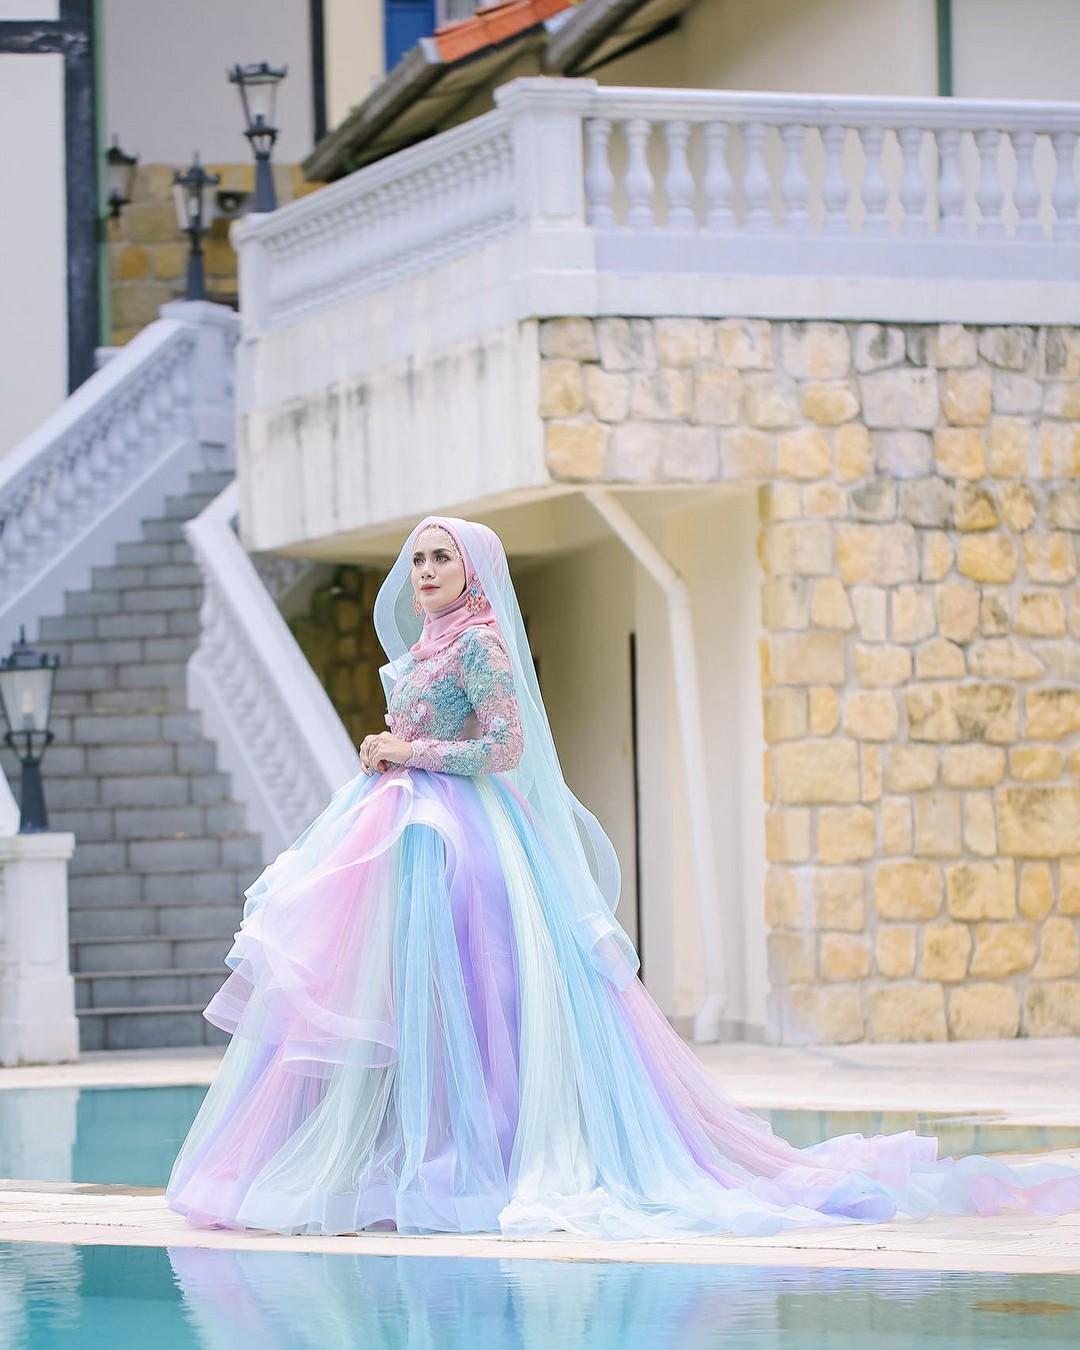 Gaun pengantin muslimah ala fairytales ~ Cikgu Norazimah